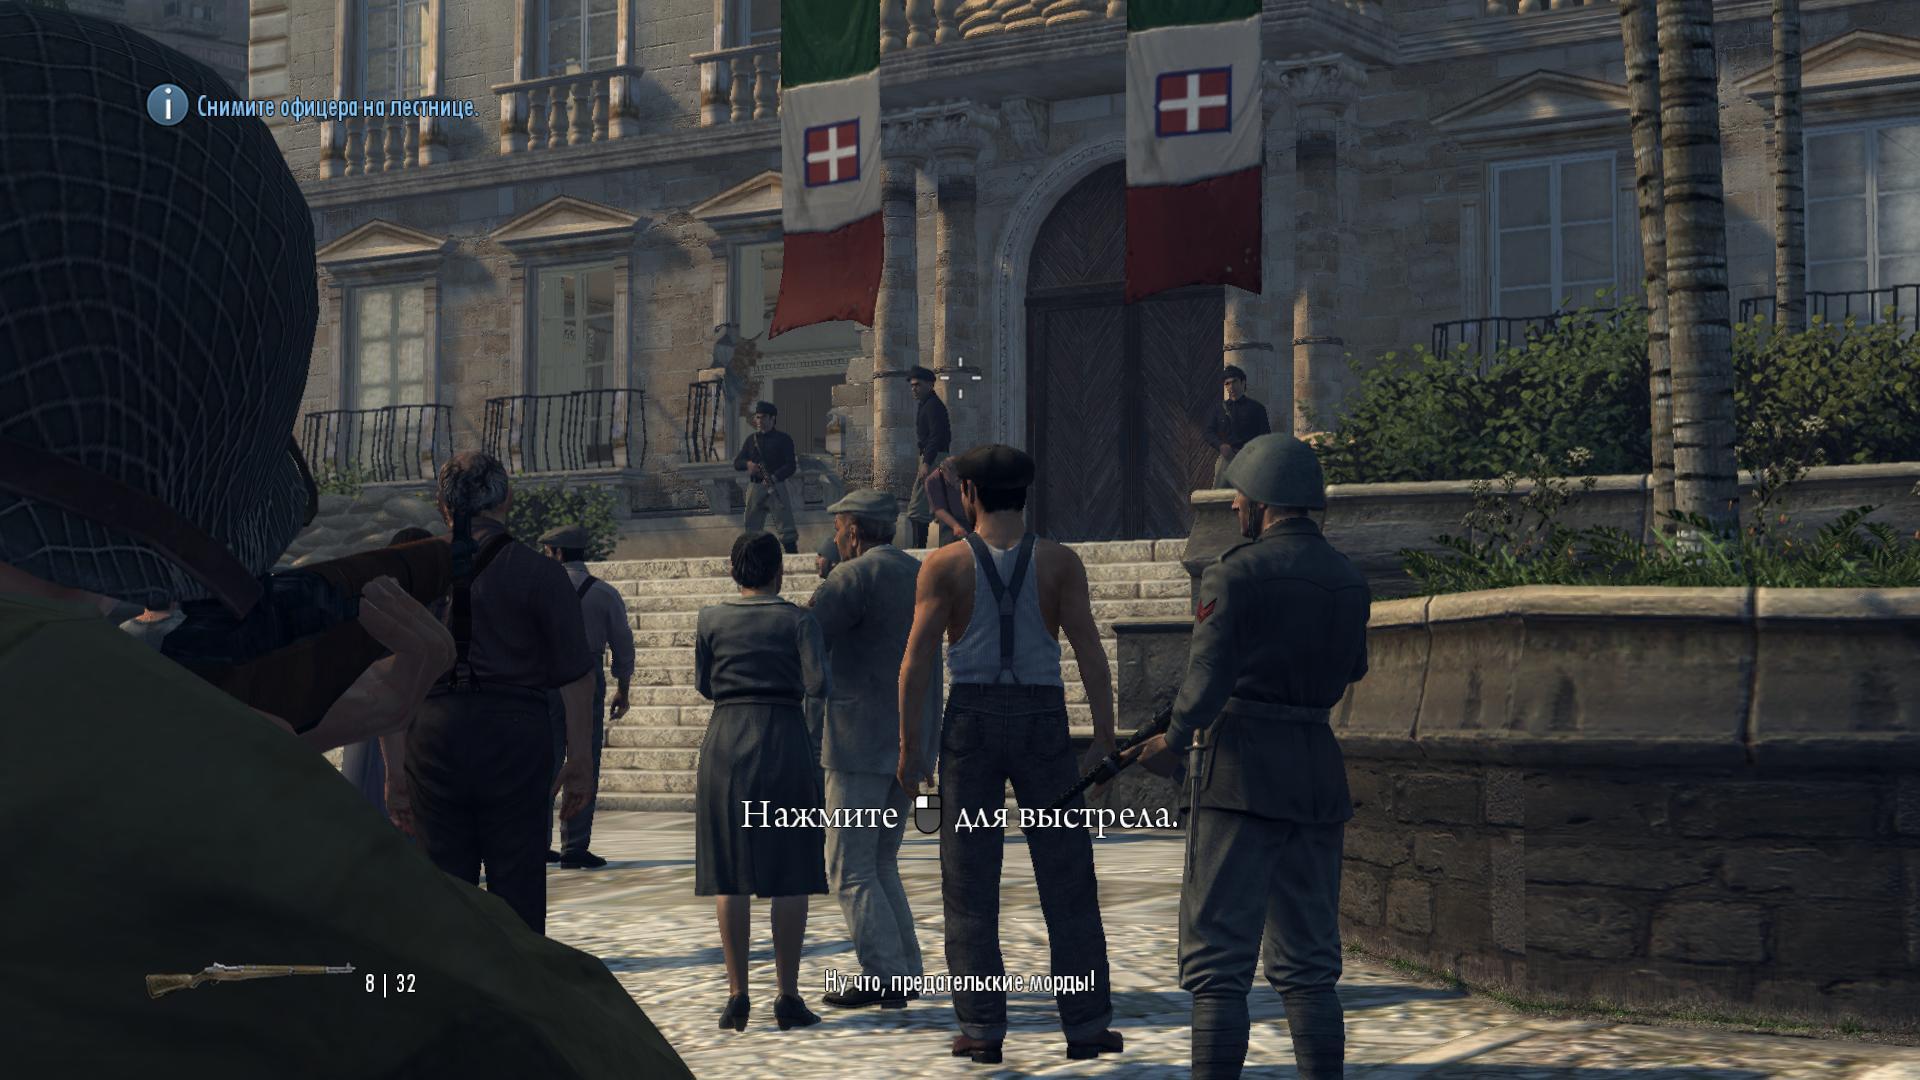 Mafia II - Расширенное издание (2010) PC - Скриншот 3